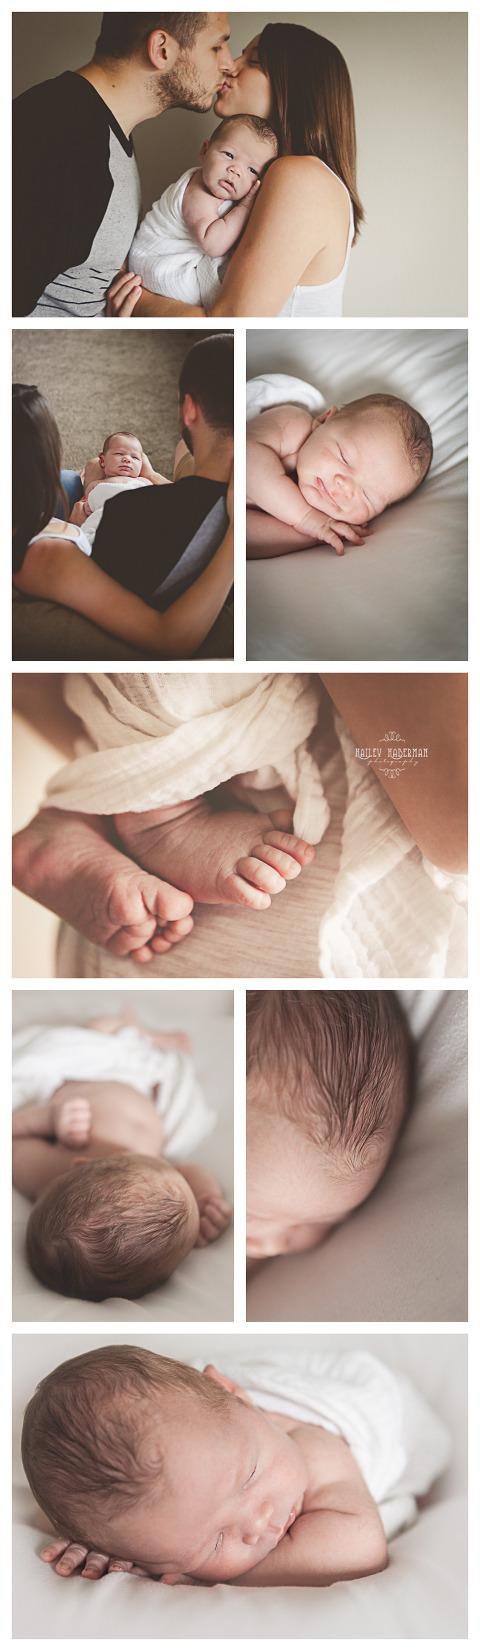 Baby Kobe in lifestyle newborn session with Hailey Haberman in Ellensburg WA